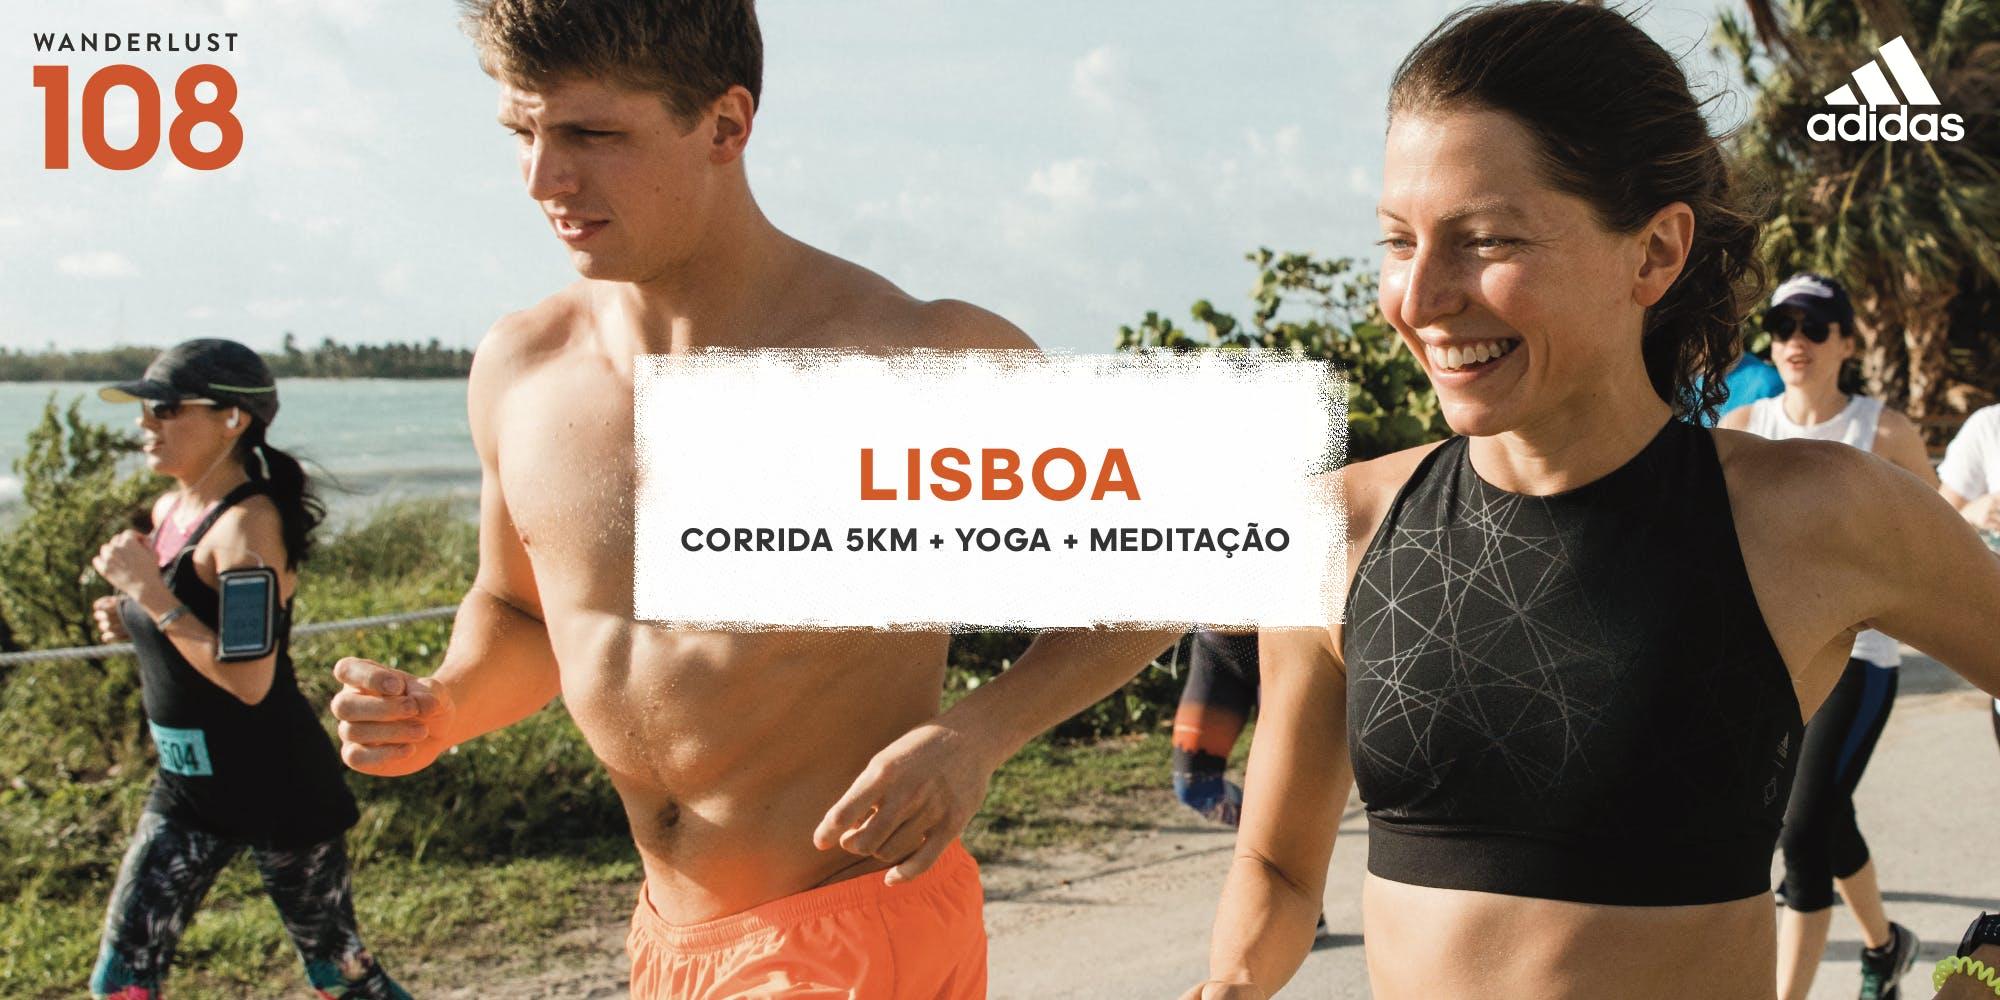 Wanderlust 108 Lisboa